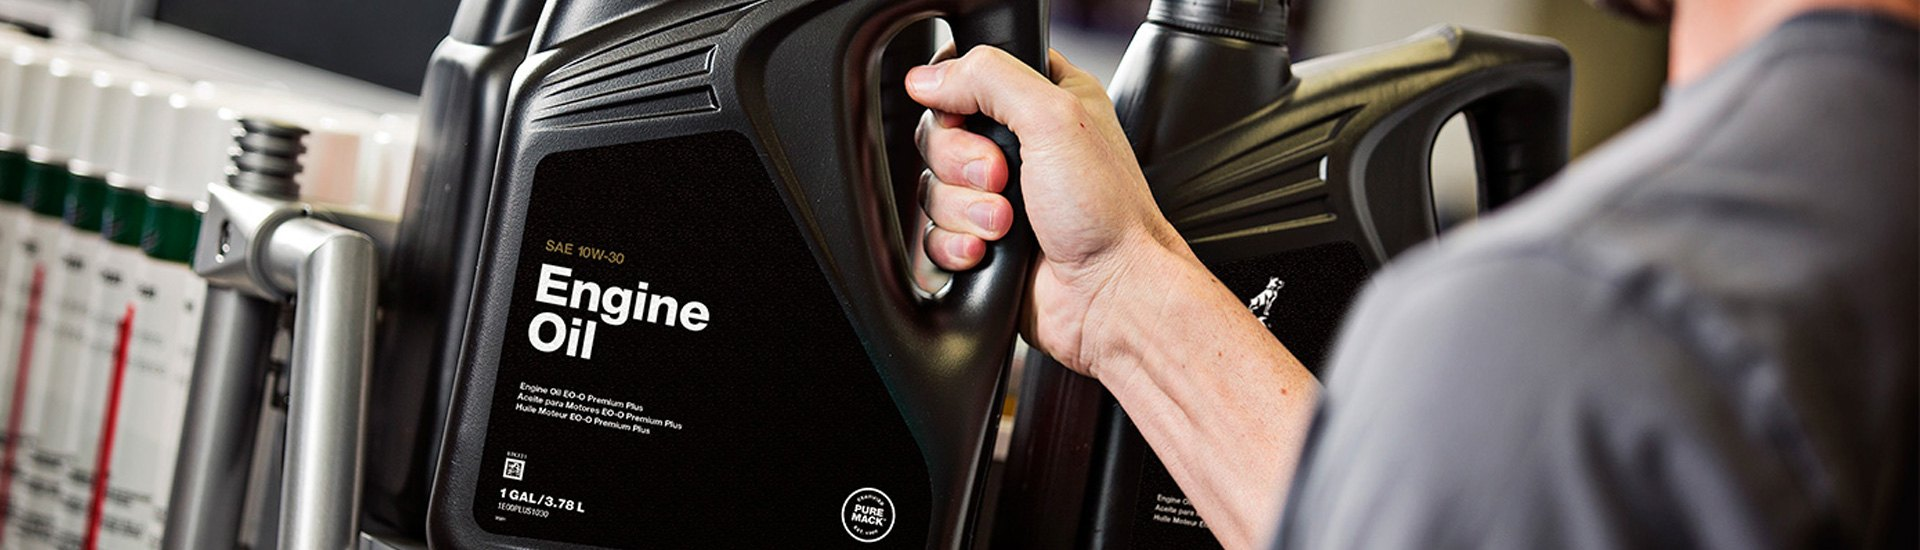 hight resolution of semi truck oils fluids lubricants